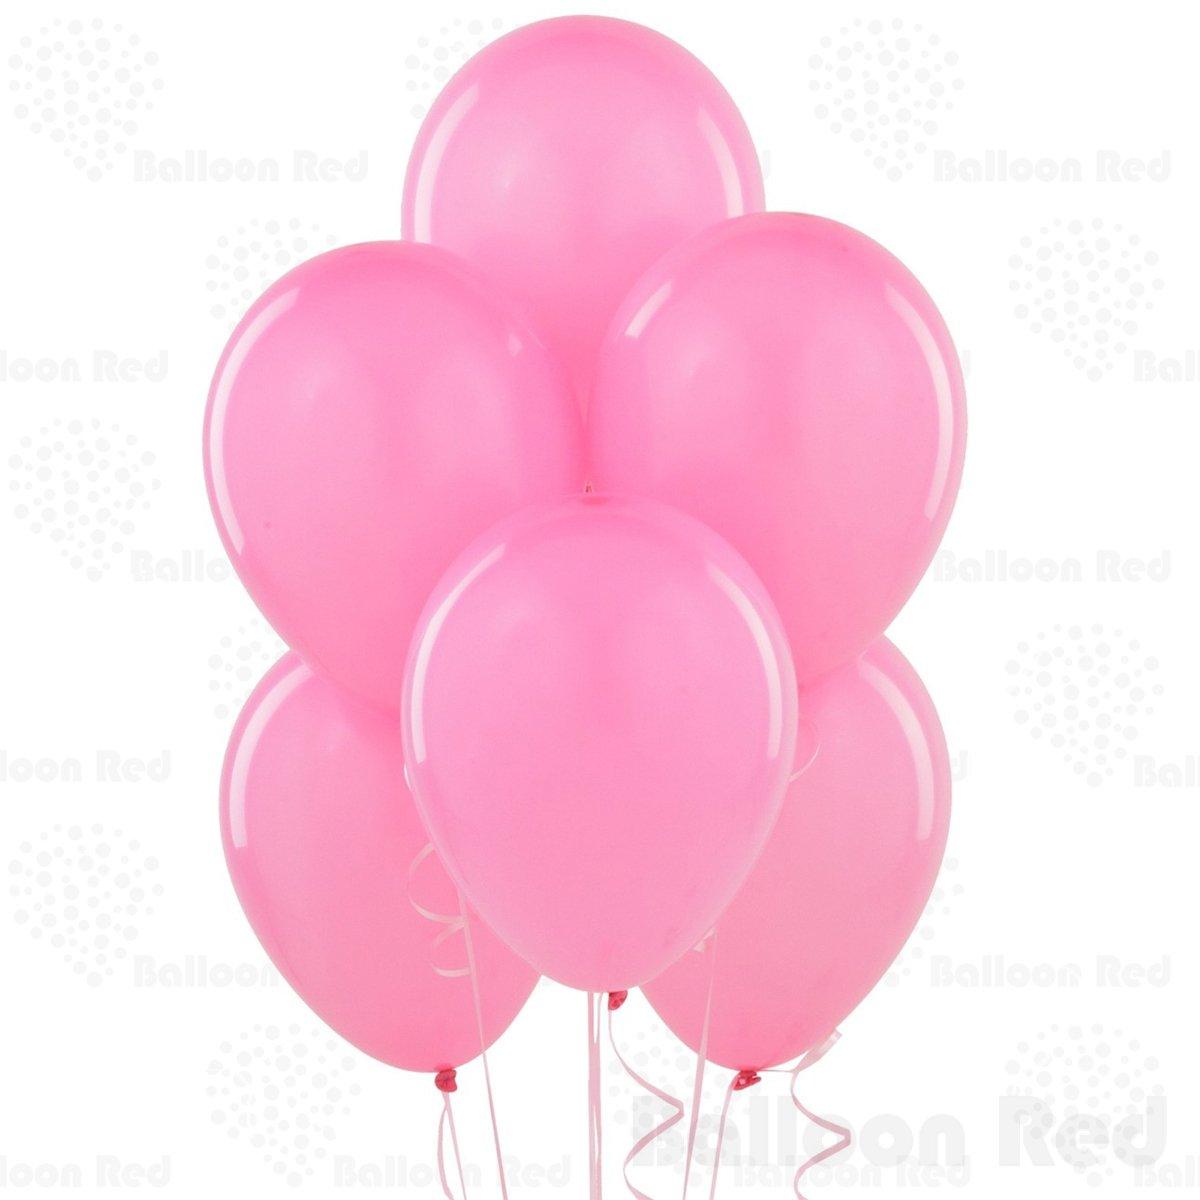 100 PLAIN BALONS BALLONS HELIUM /& AIR BALLOONS Quality Party Birthday Wedding